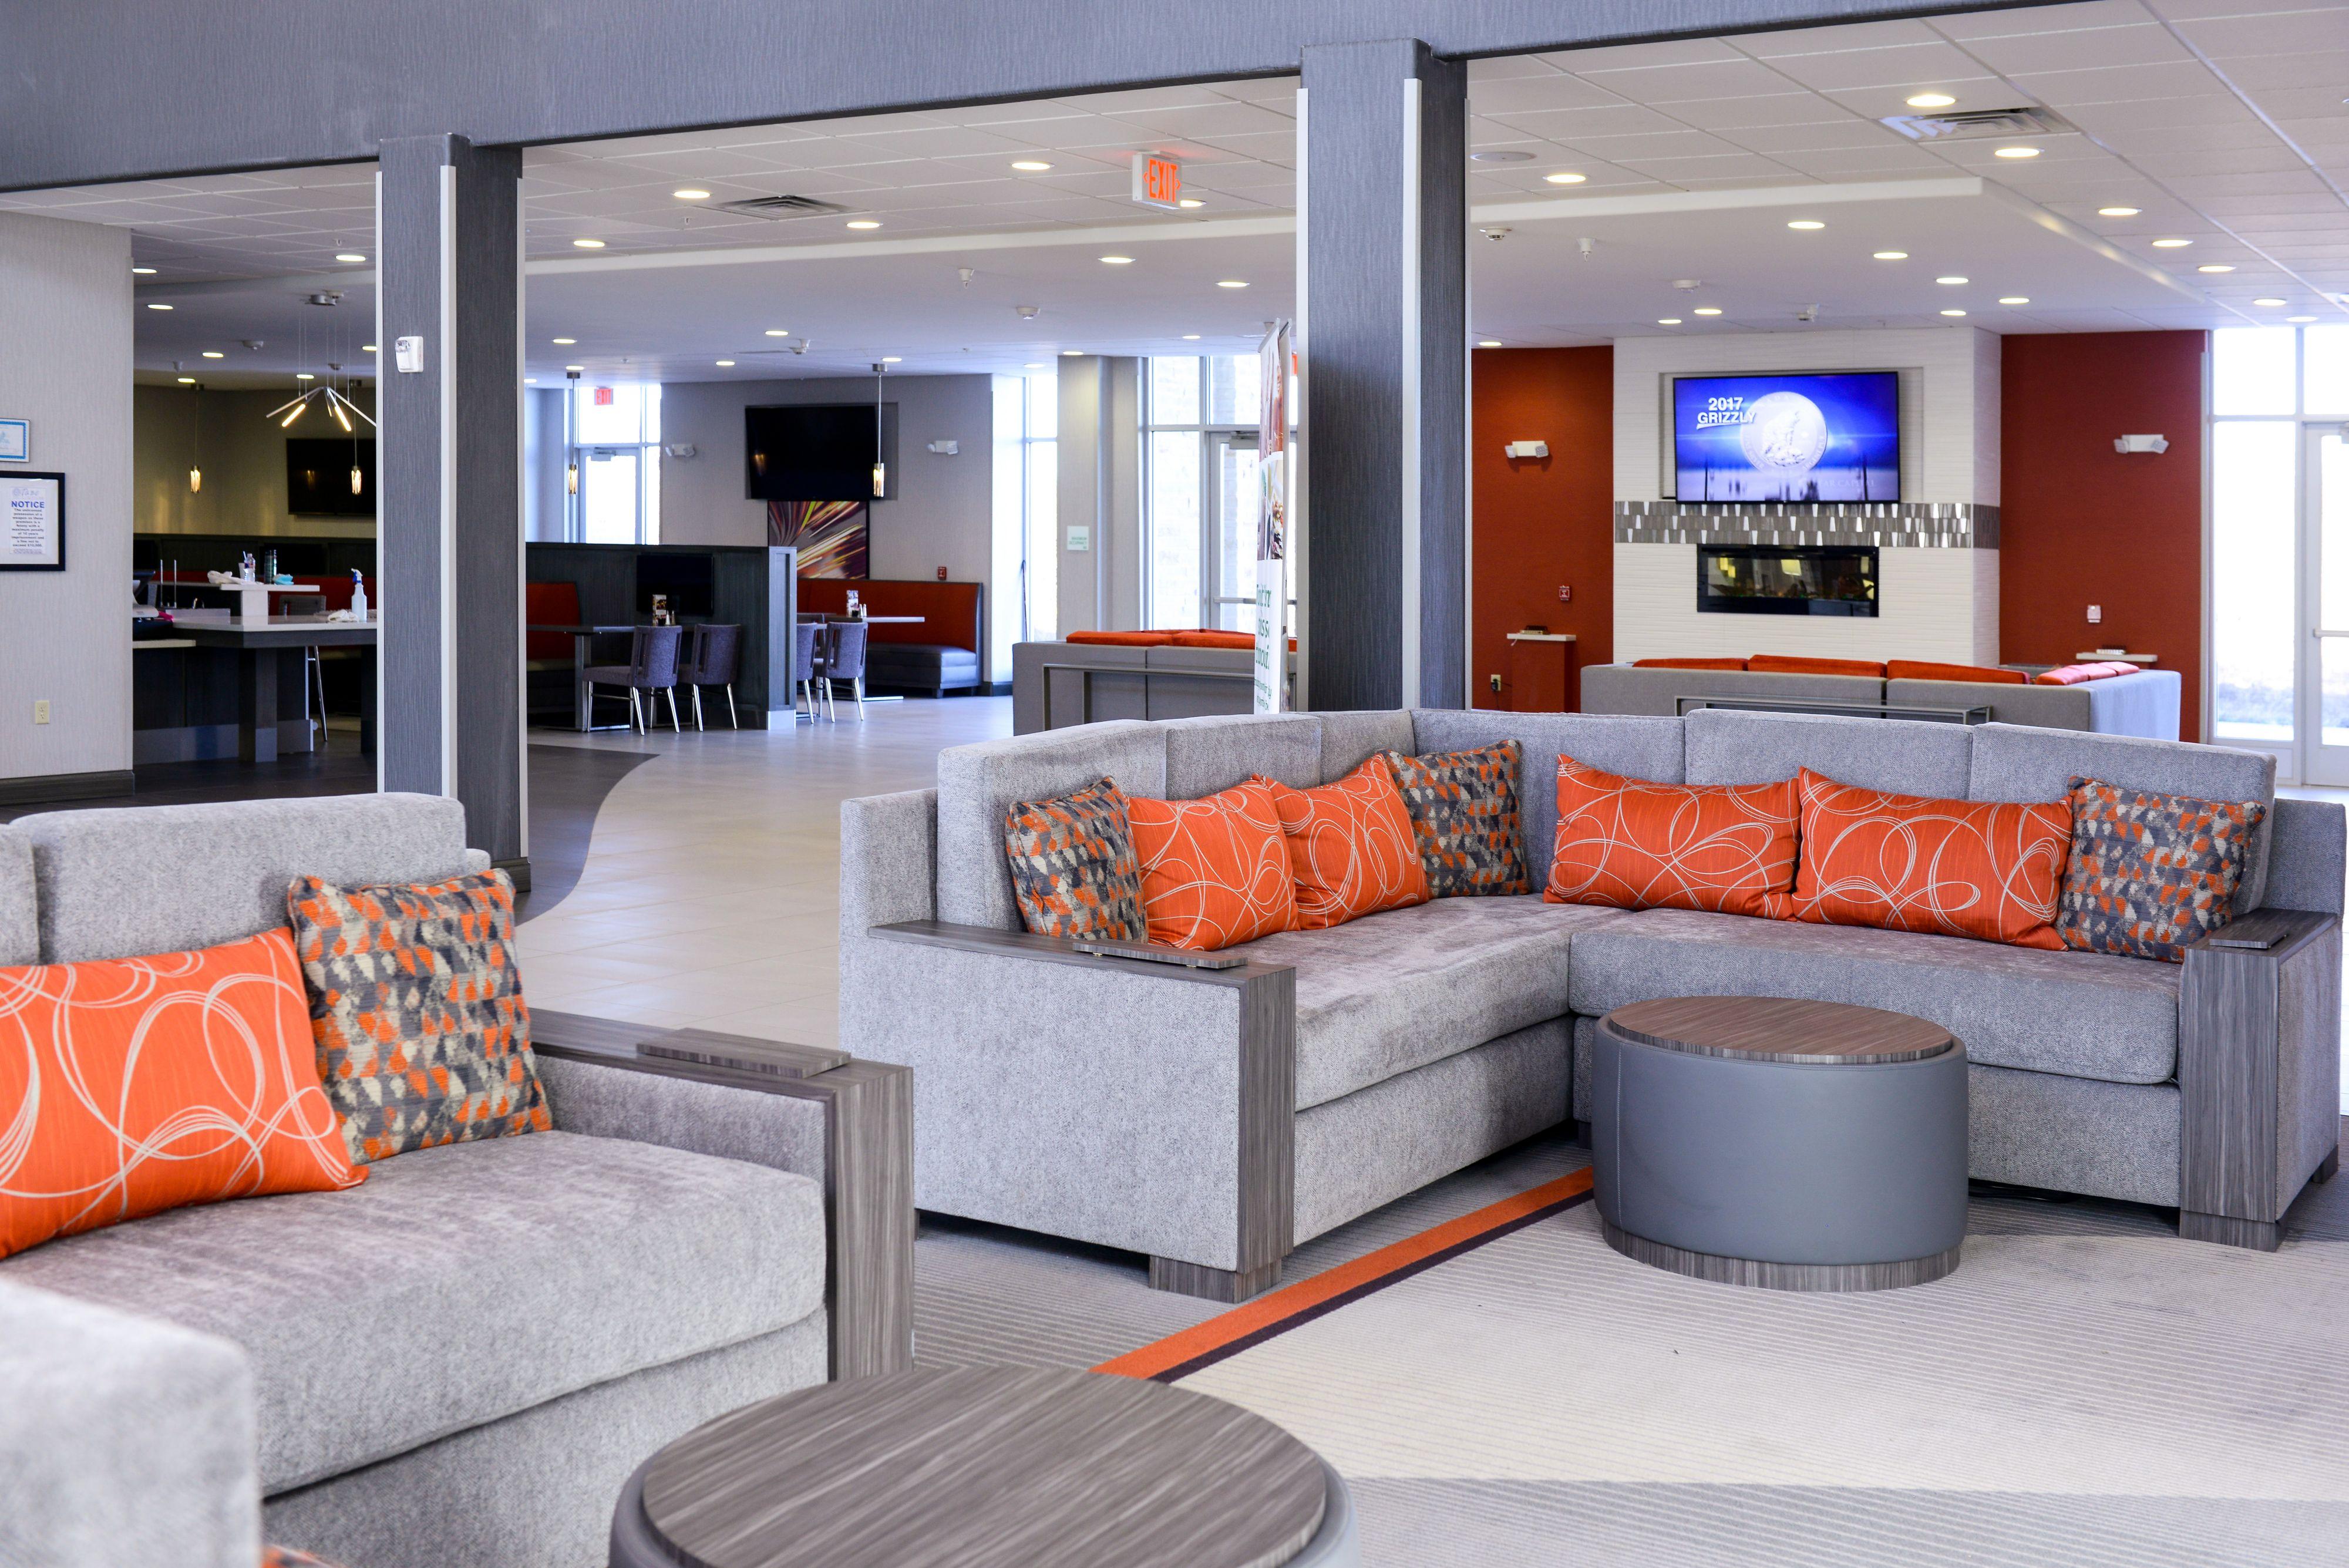 Holiday Inn Abilene - North College Area image 2